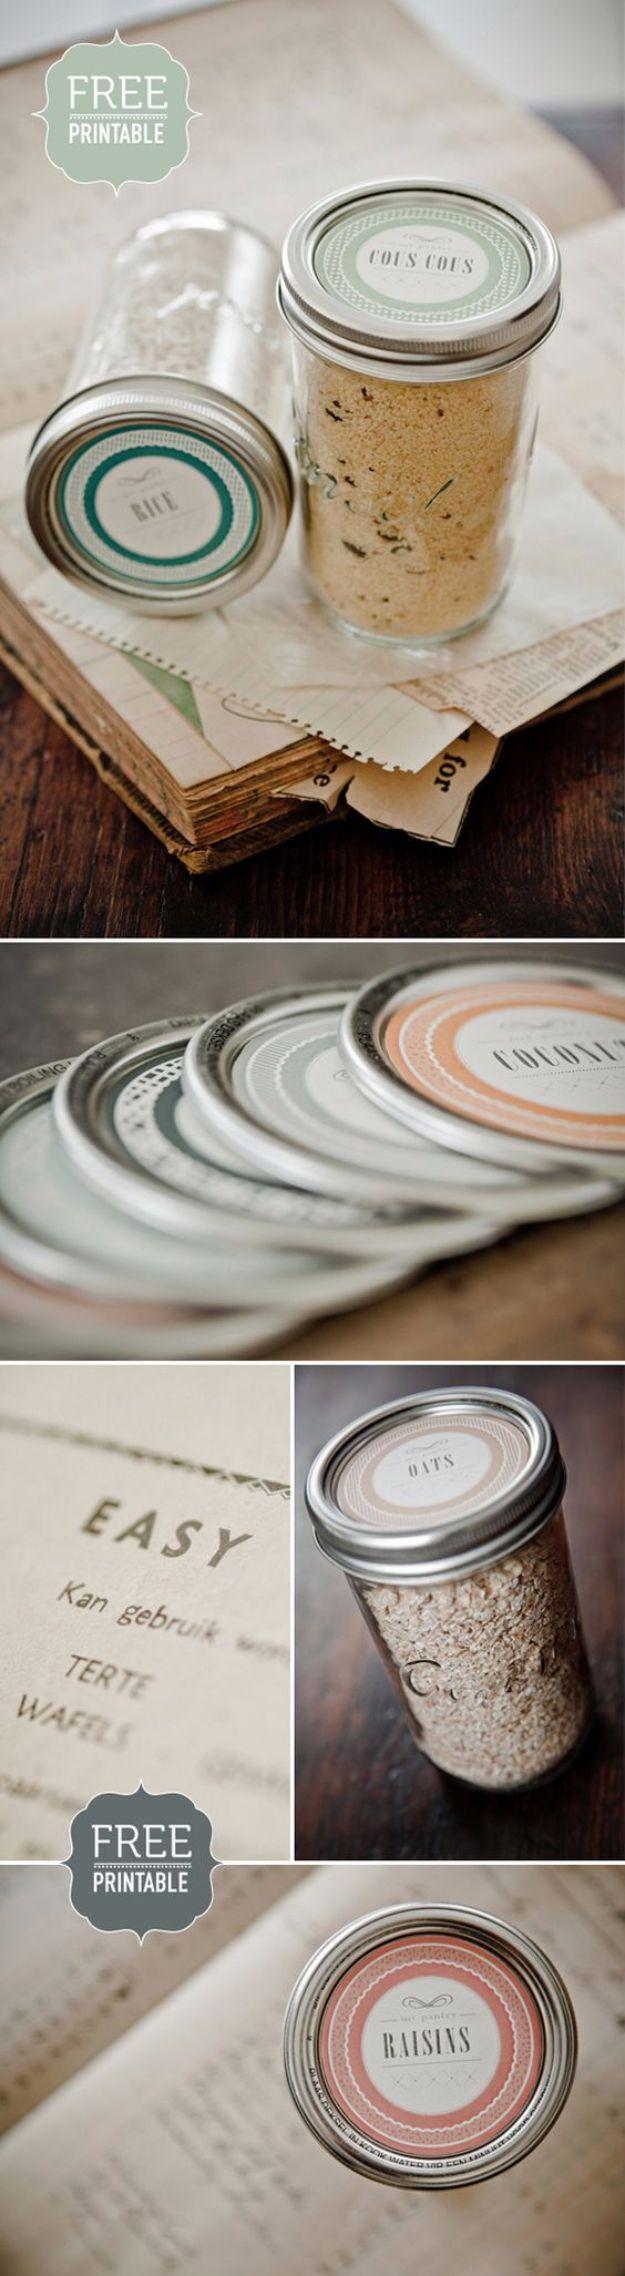 Free Printables for Mason Jars - Free Printable Mason Jar Lid Template - Best Ideas for Tags and Printable Clip Art for Fun Mason Jar Gifts and Organization#masonjar #crafts #printables